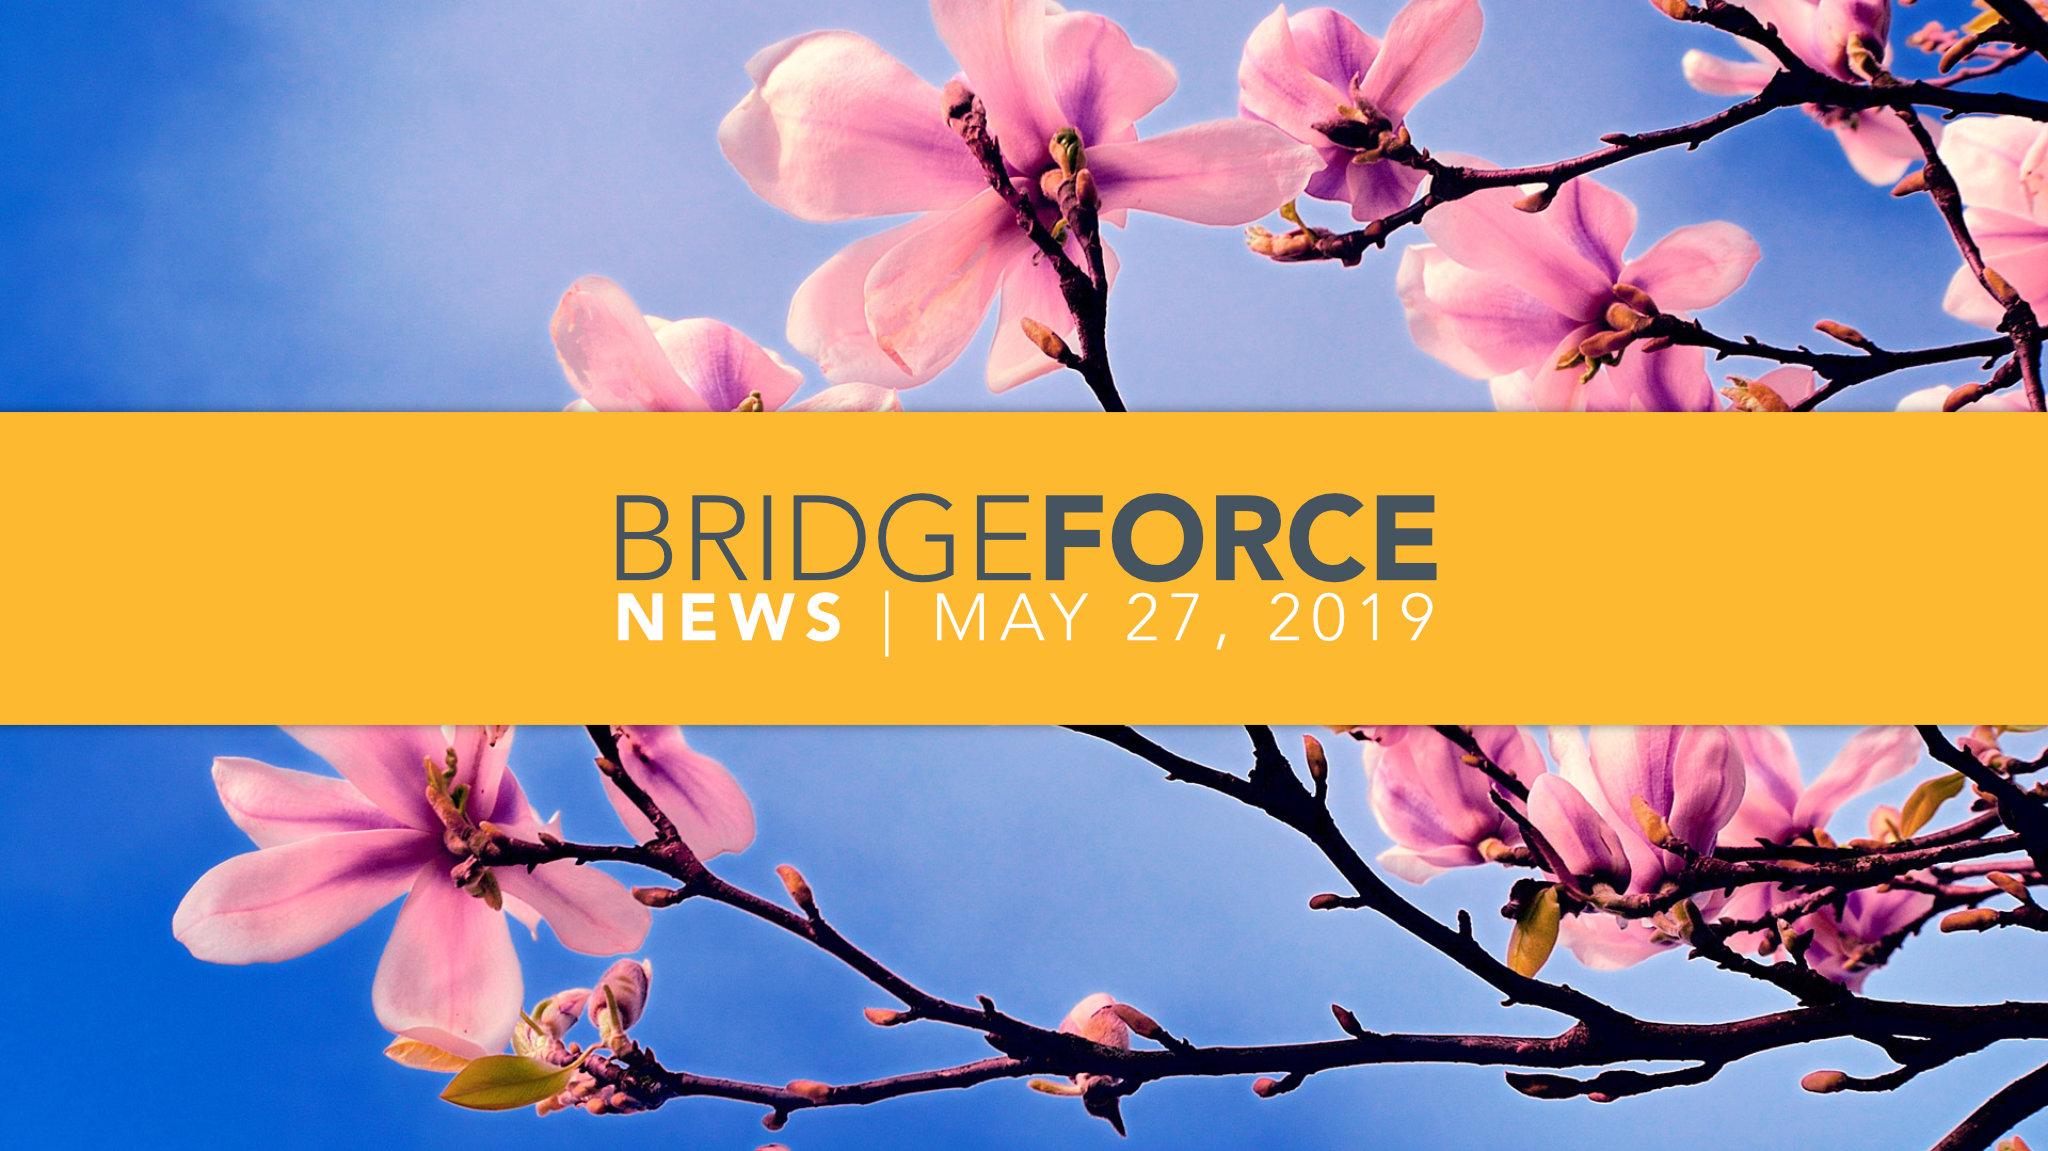 BridgeForce News